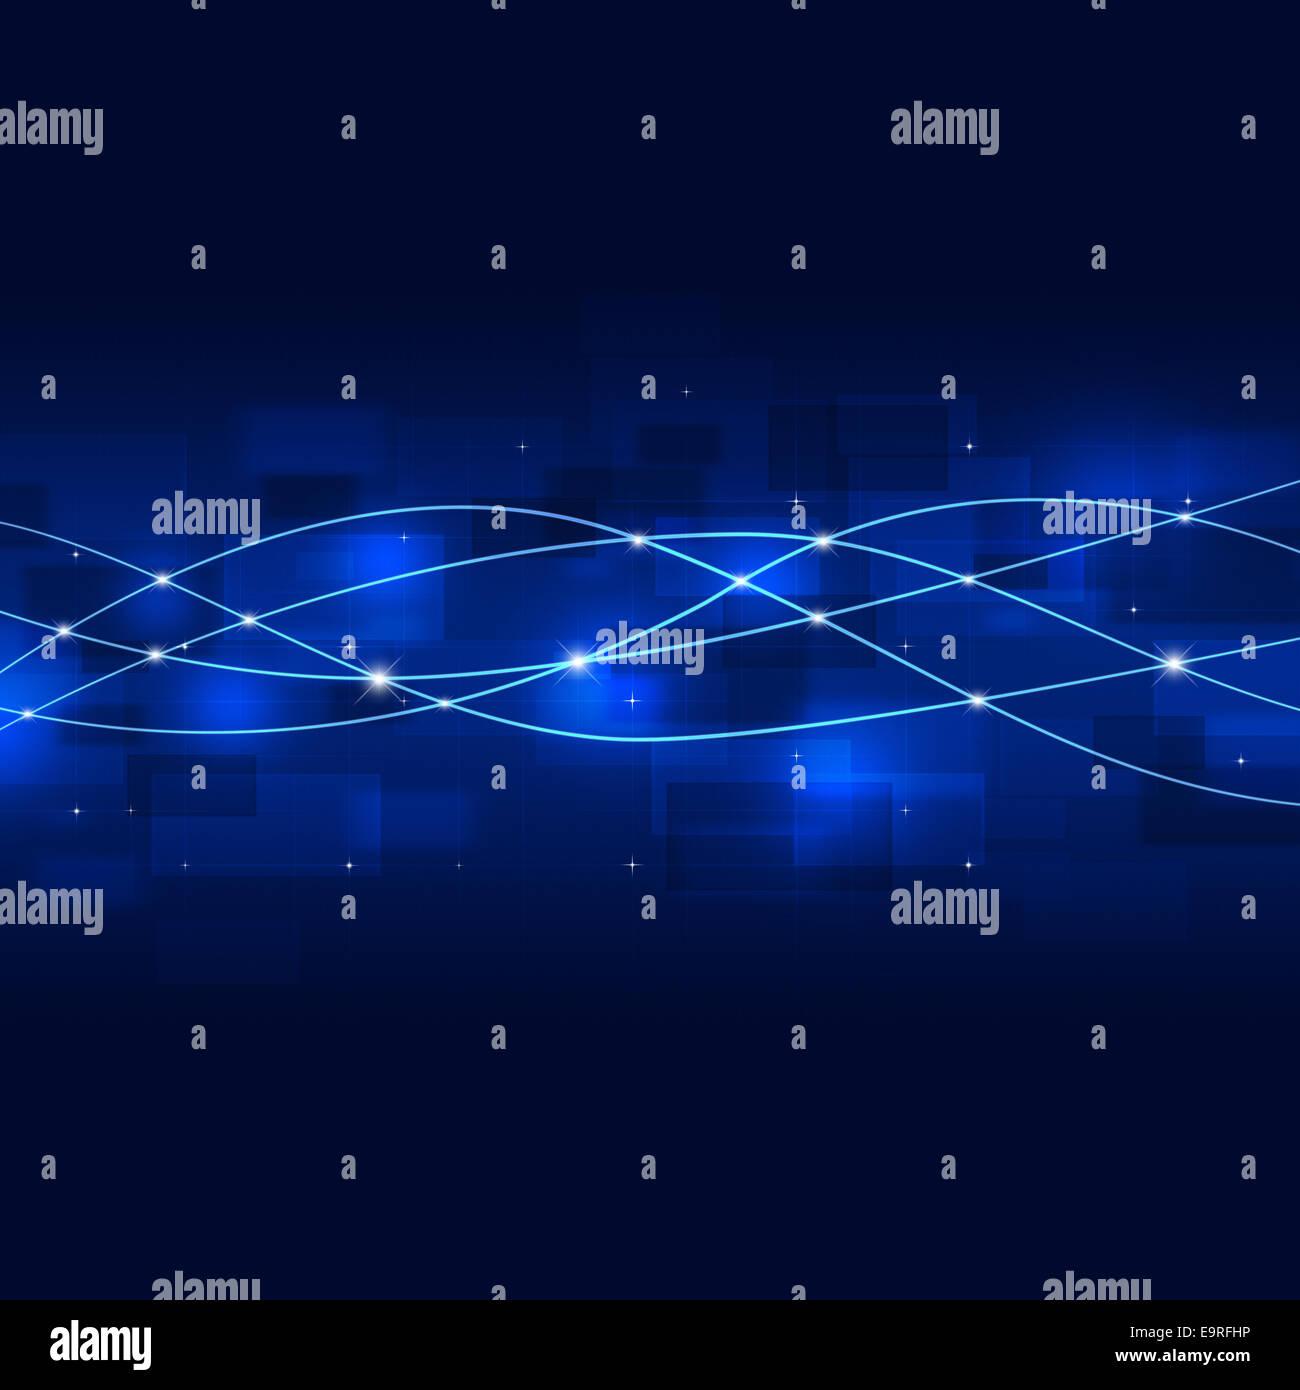 Resumen de tecnología de red global business connection fondo azul Foto de stock